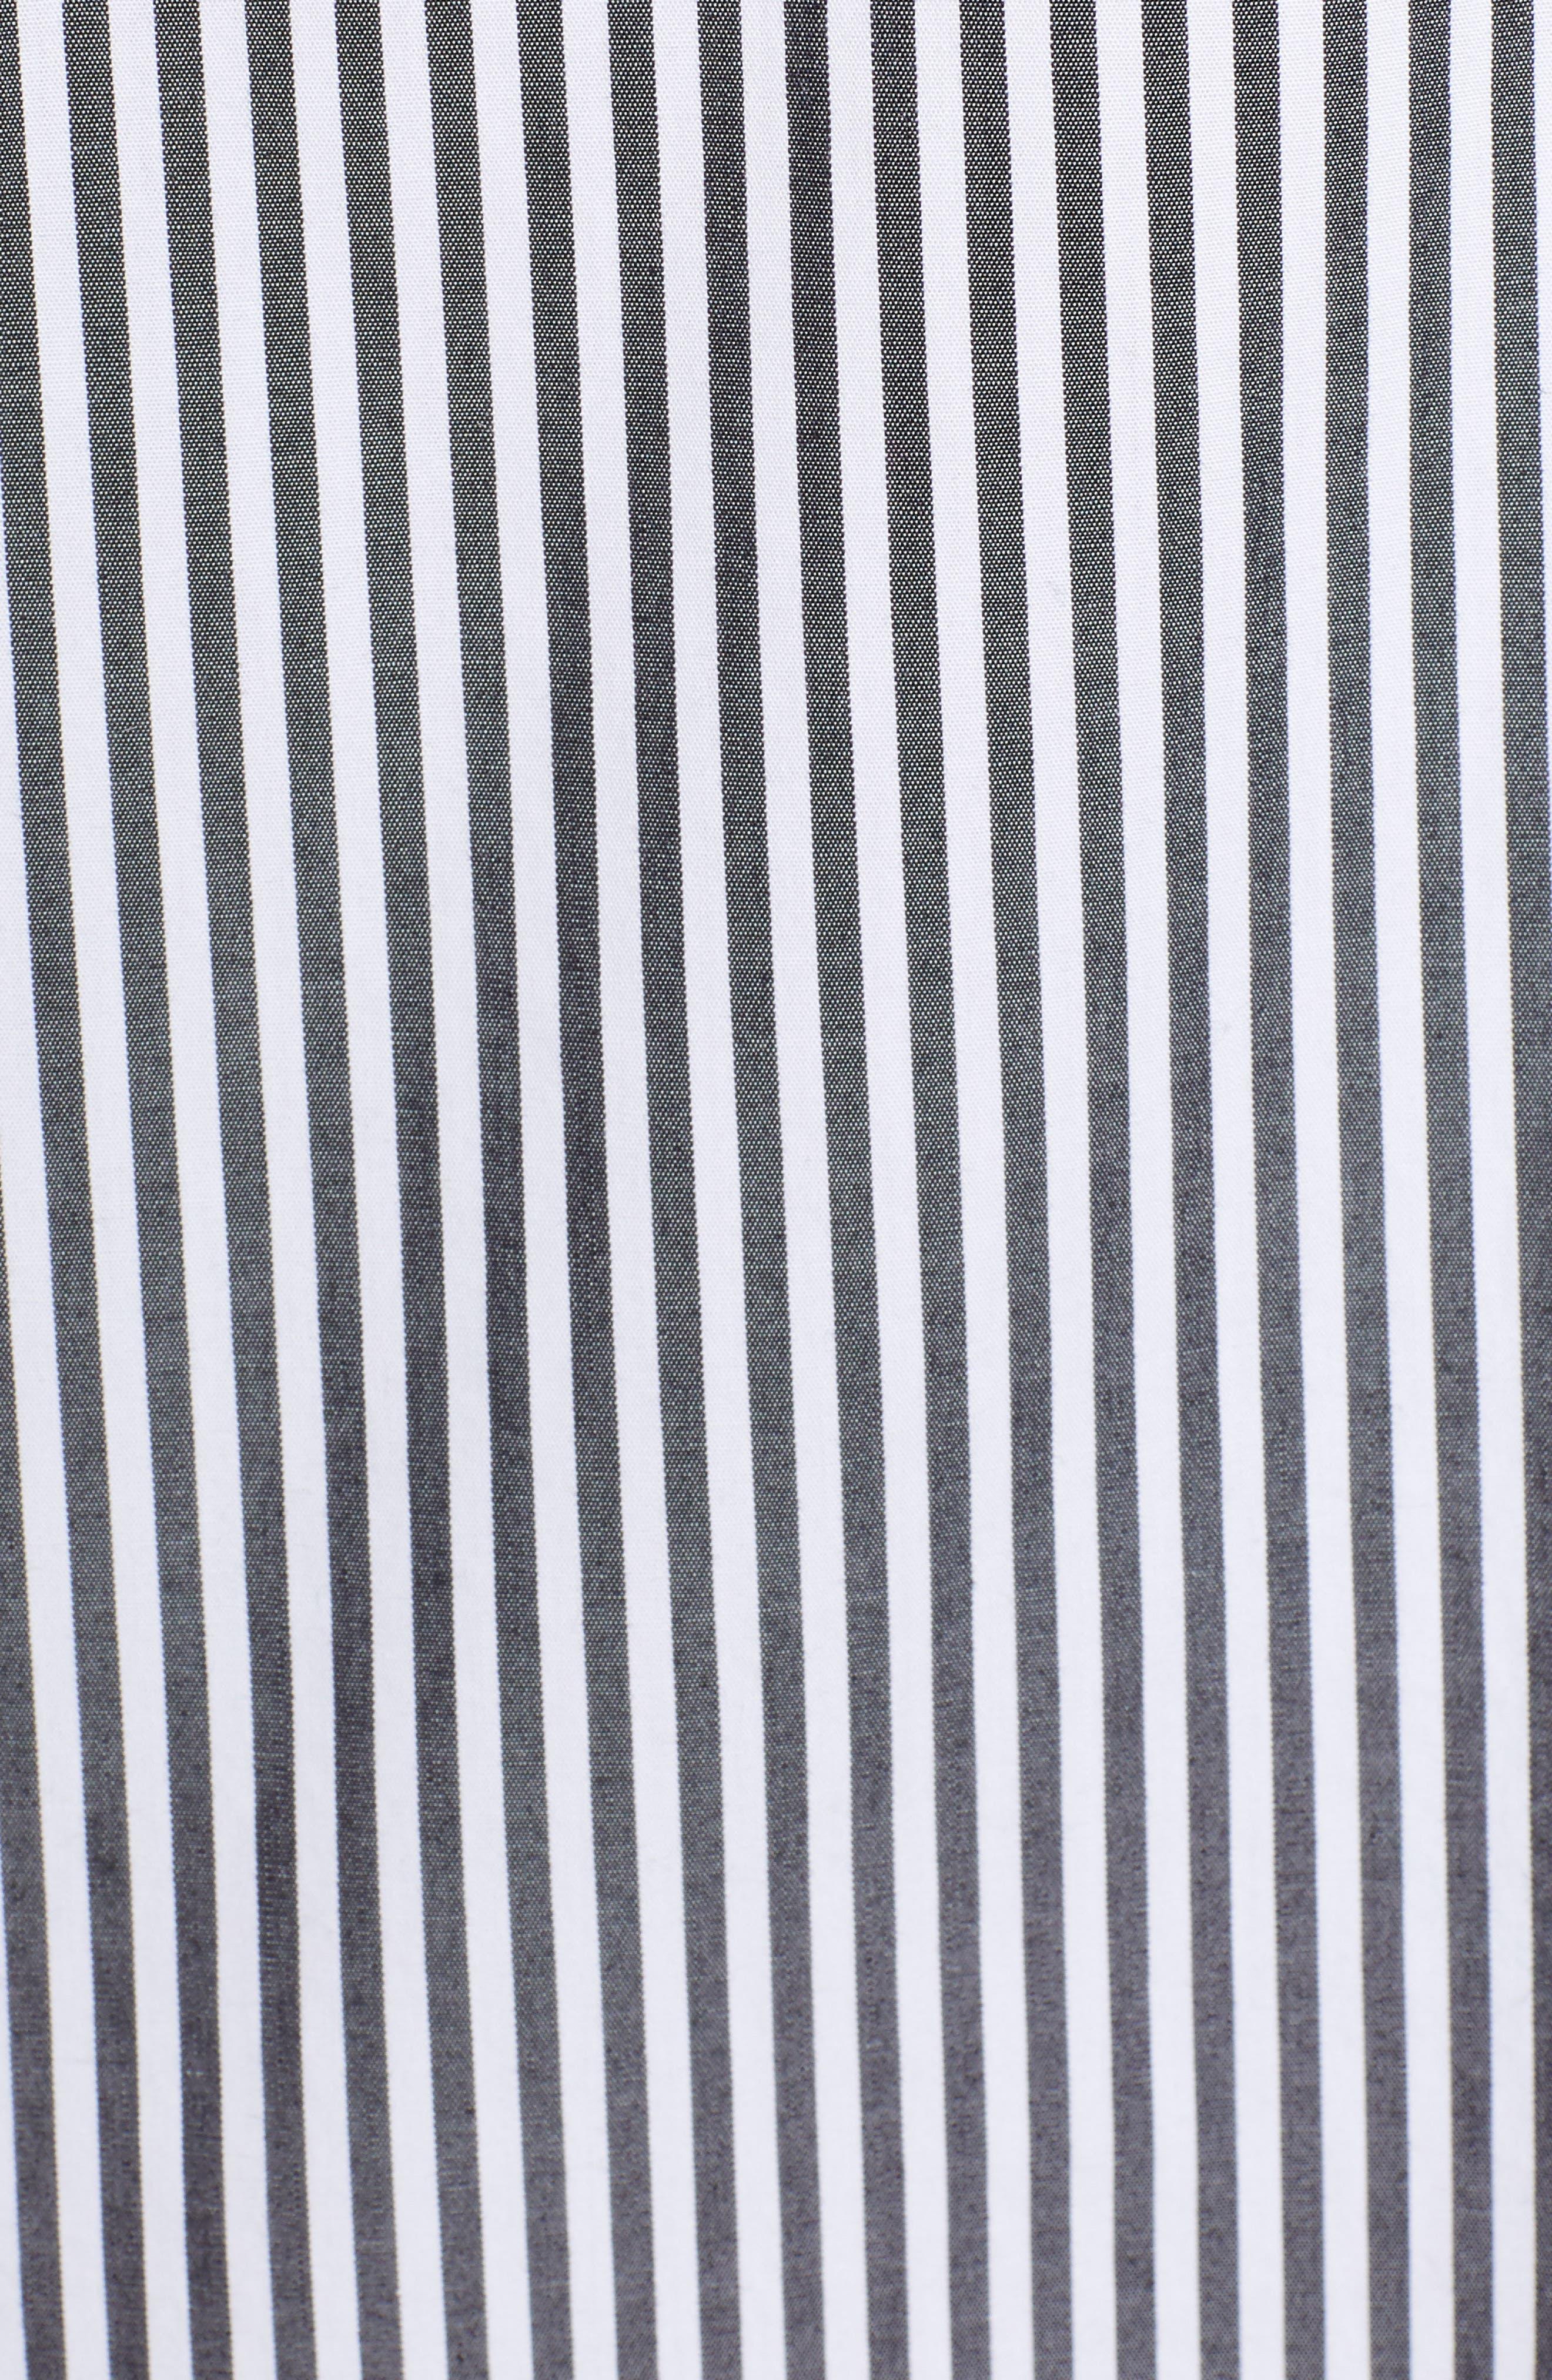 Stripe Utility Shirtdress,                             Alternate thumbnail 6, color,                             002